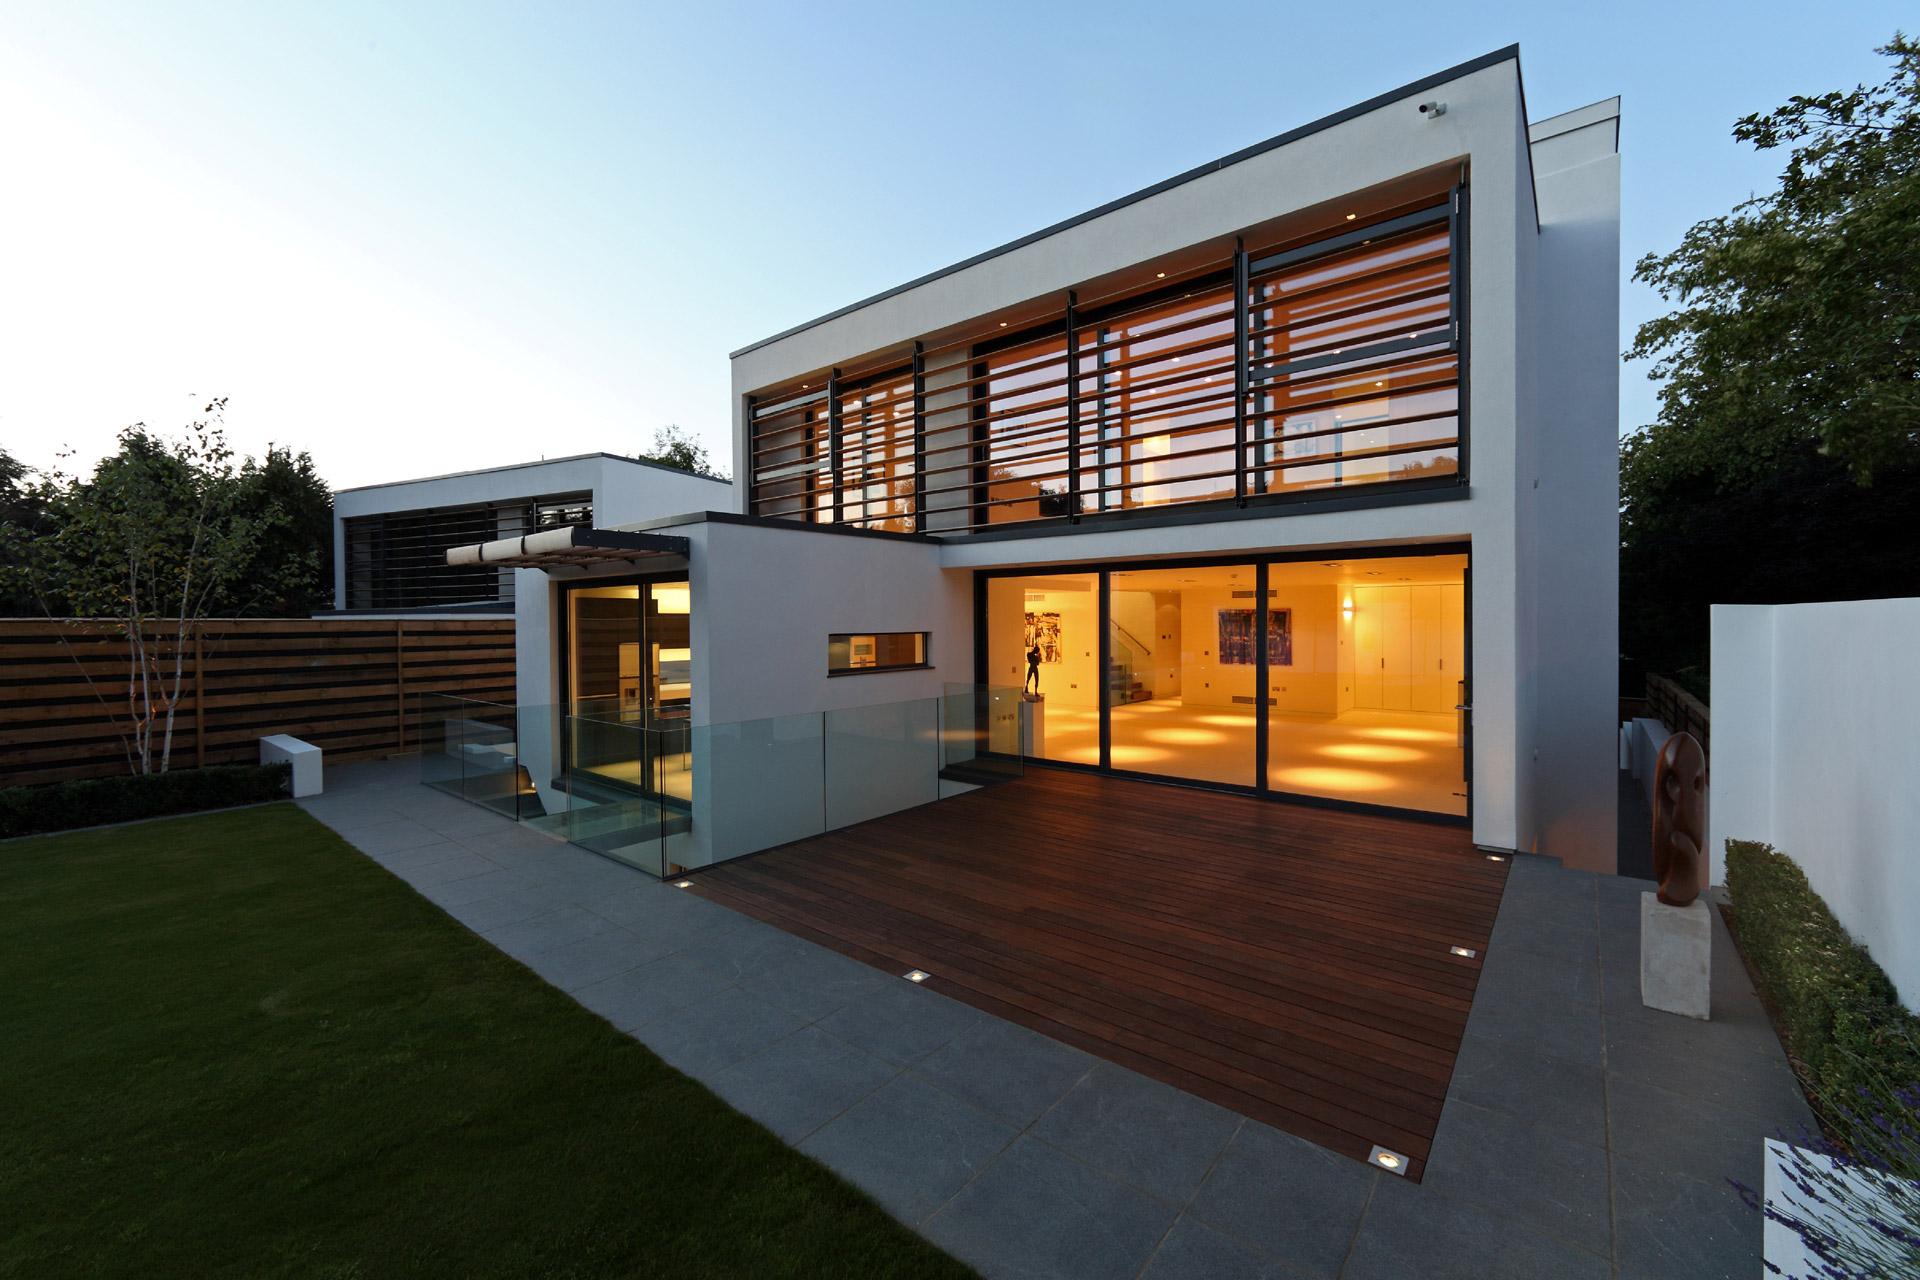 Residential Architecture Architects London Beds Herts Birmingham Bucks Es